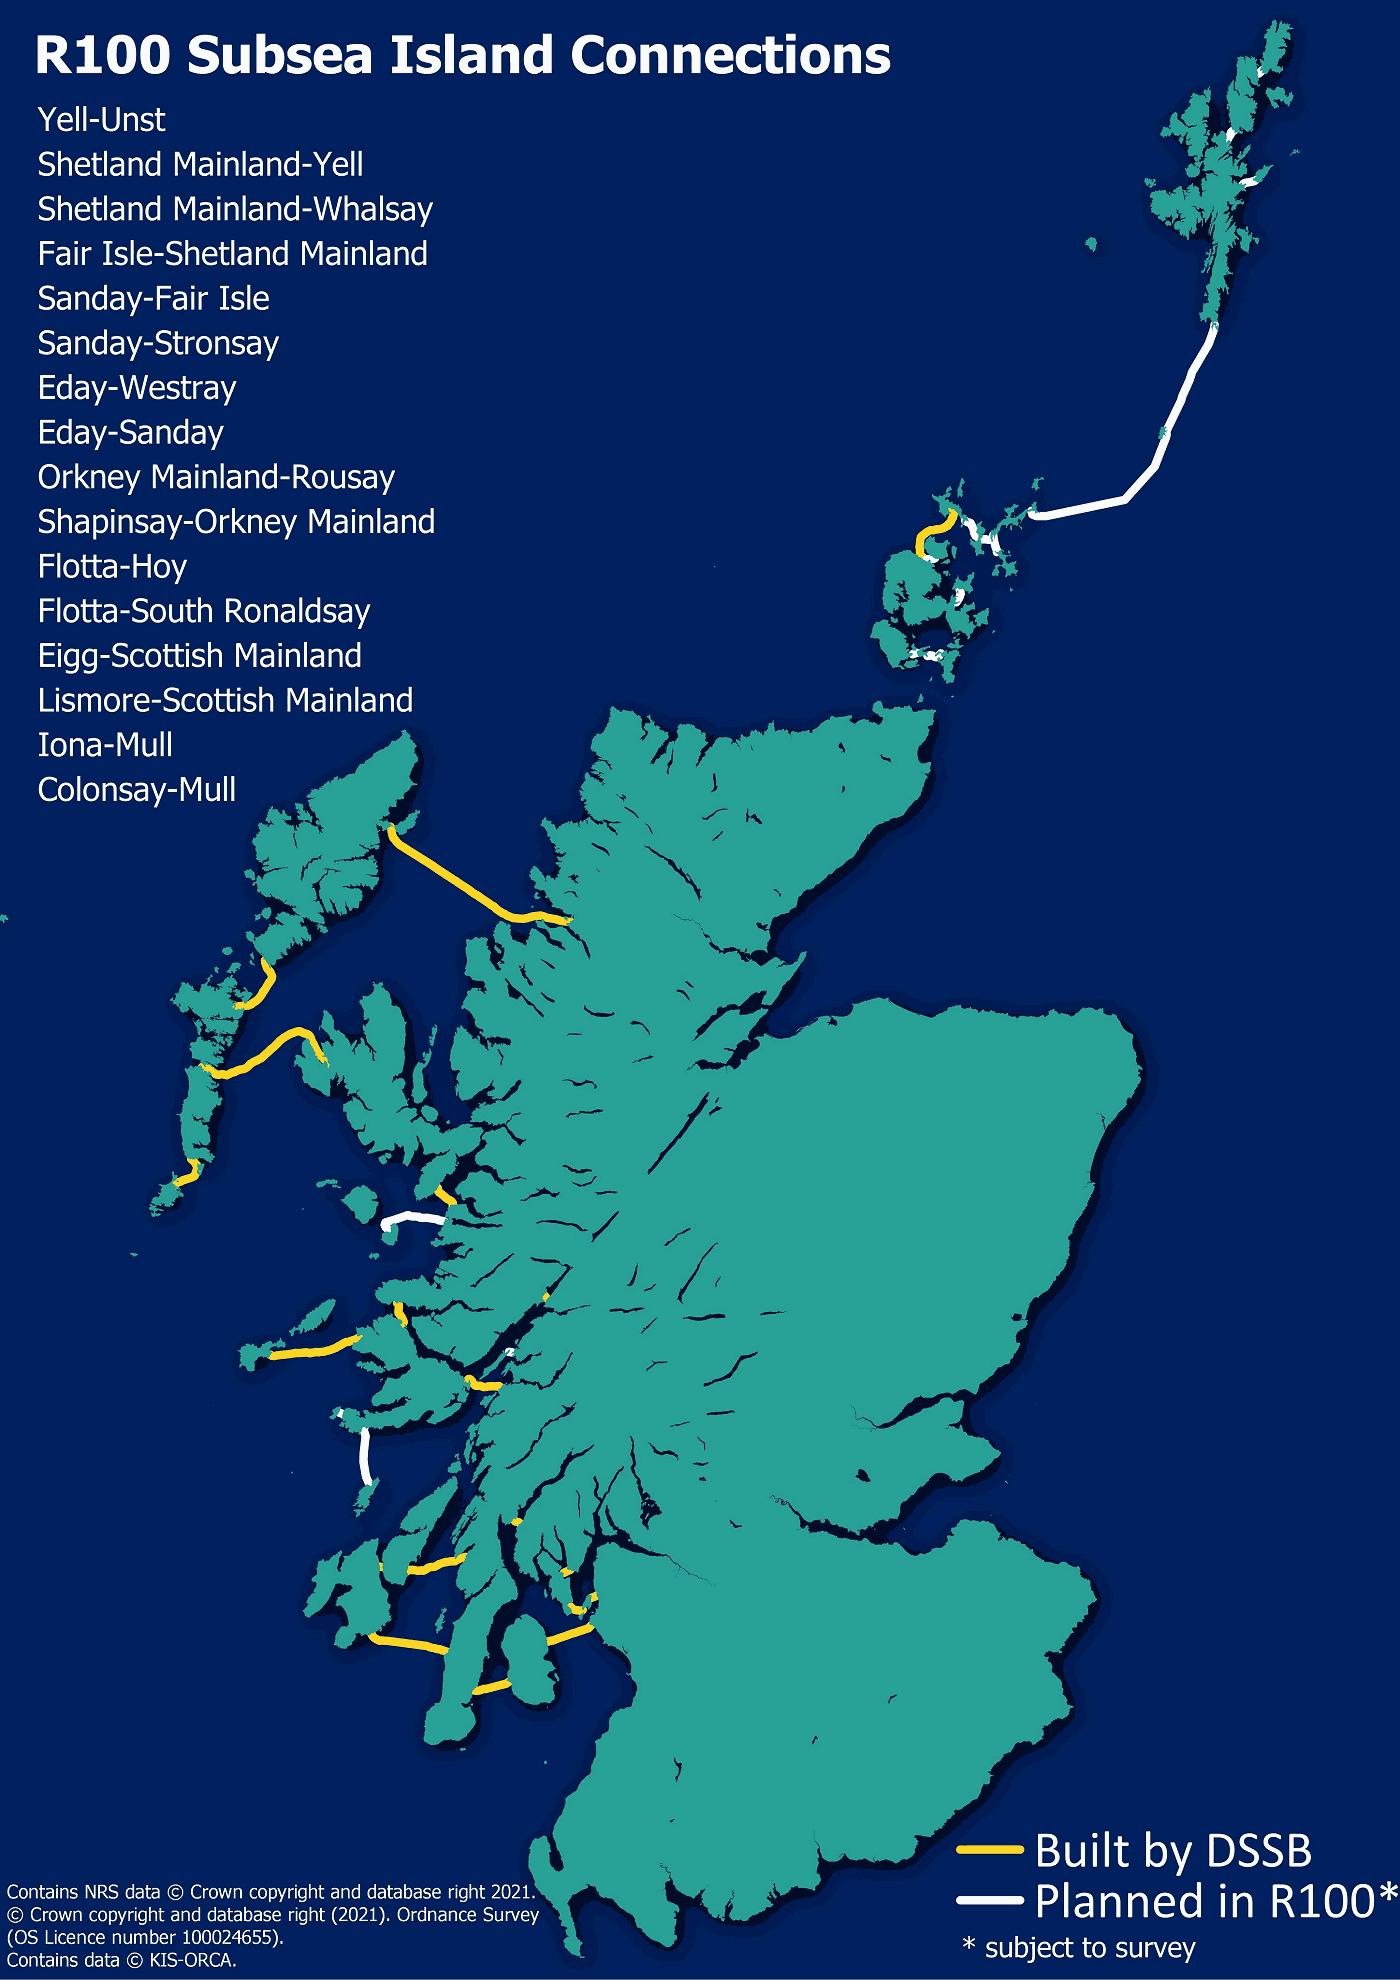 Scotland_R100_Lot1_Subsea_BT_fibre_map